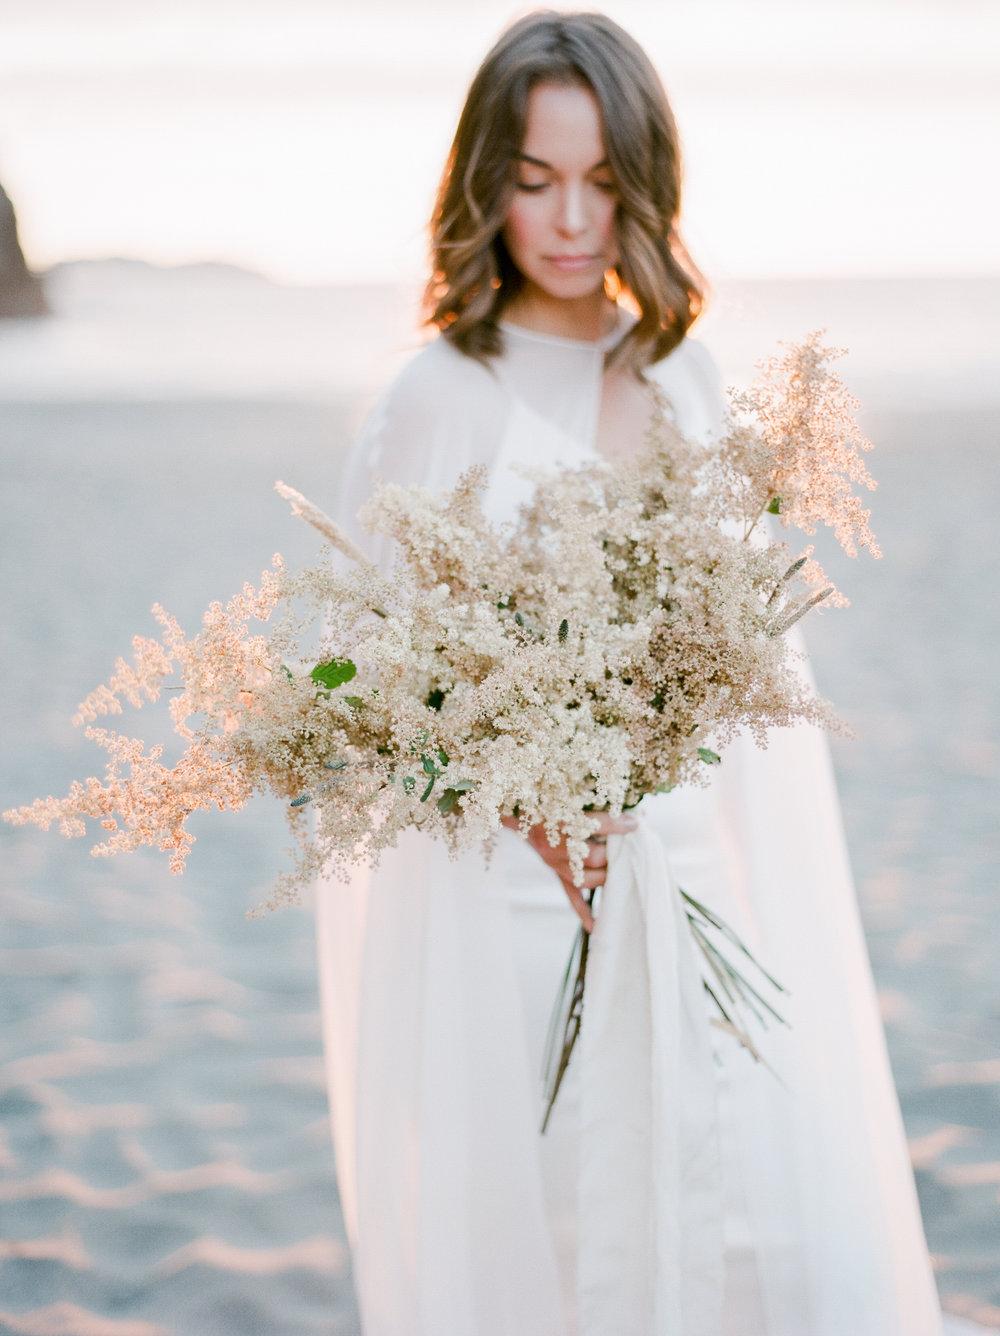 LOST COAST ELOPEMENT - STYLING // Featured on Joy Wed& B-Loved Luxury WeddingsPhotography by www.madalinasheldon.com